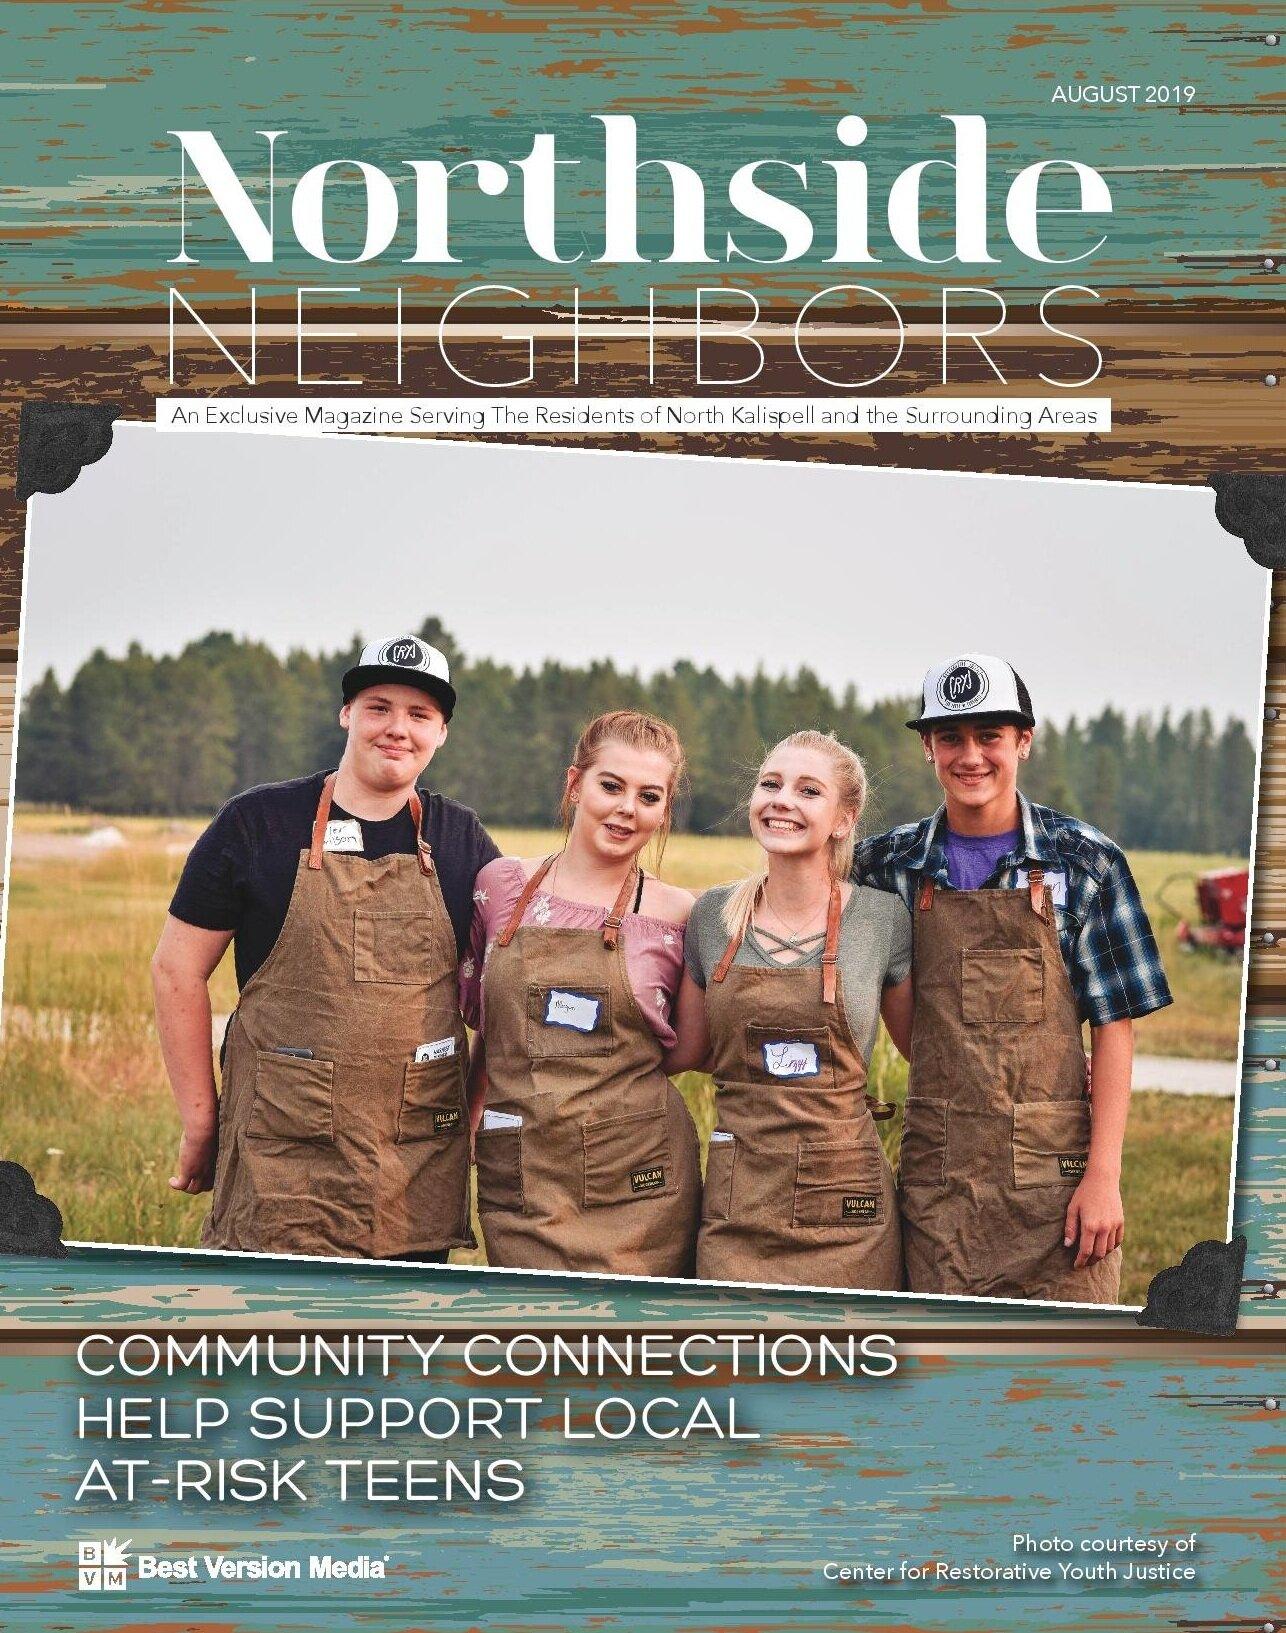 NorthsideNeighbors_Aug19